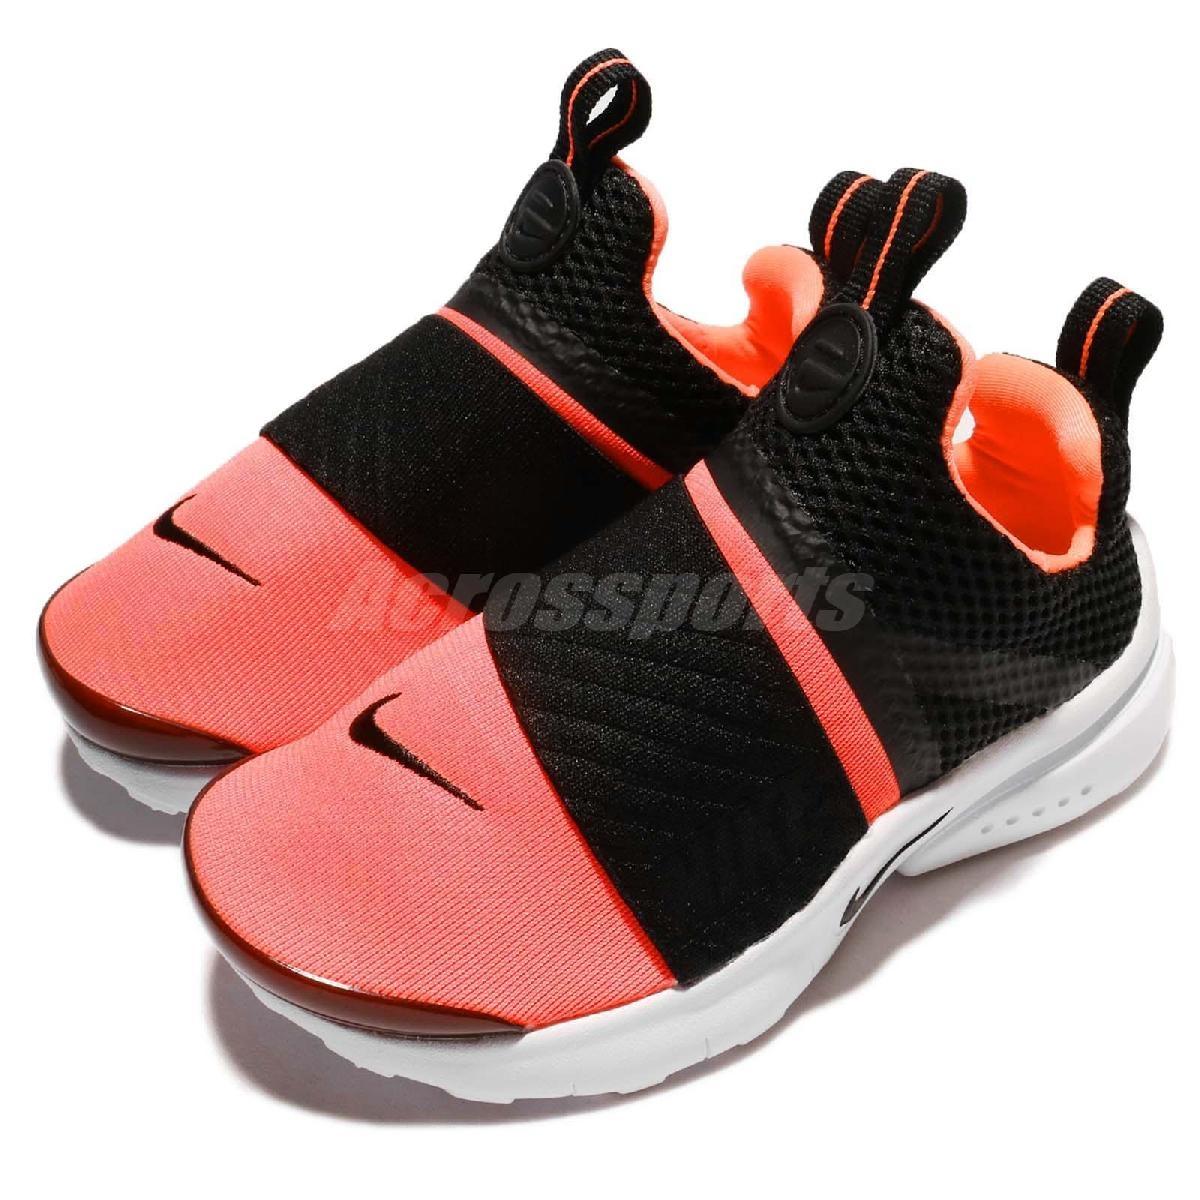 Nike休閒慢跑鞋Presto Extreme TD黑橘紅低筒無鞋帶襪套式嬰兒小童鞋Baby鞋PUMP306 870021-001